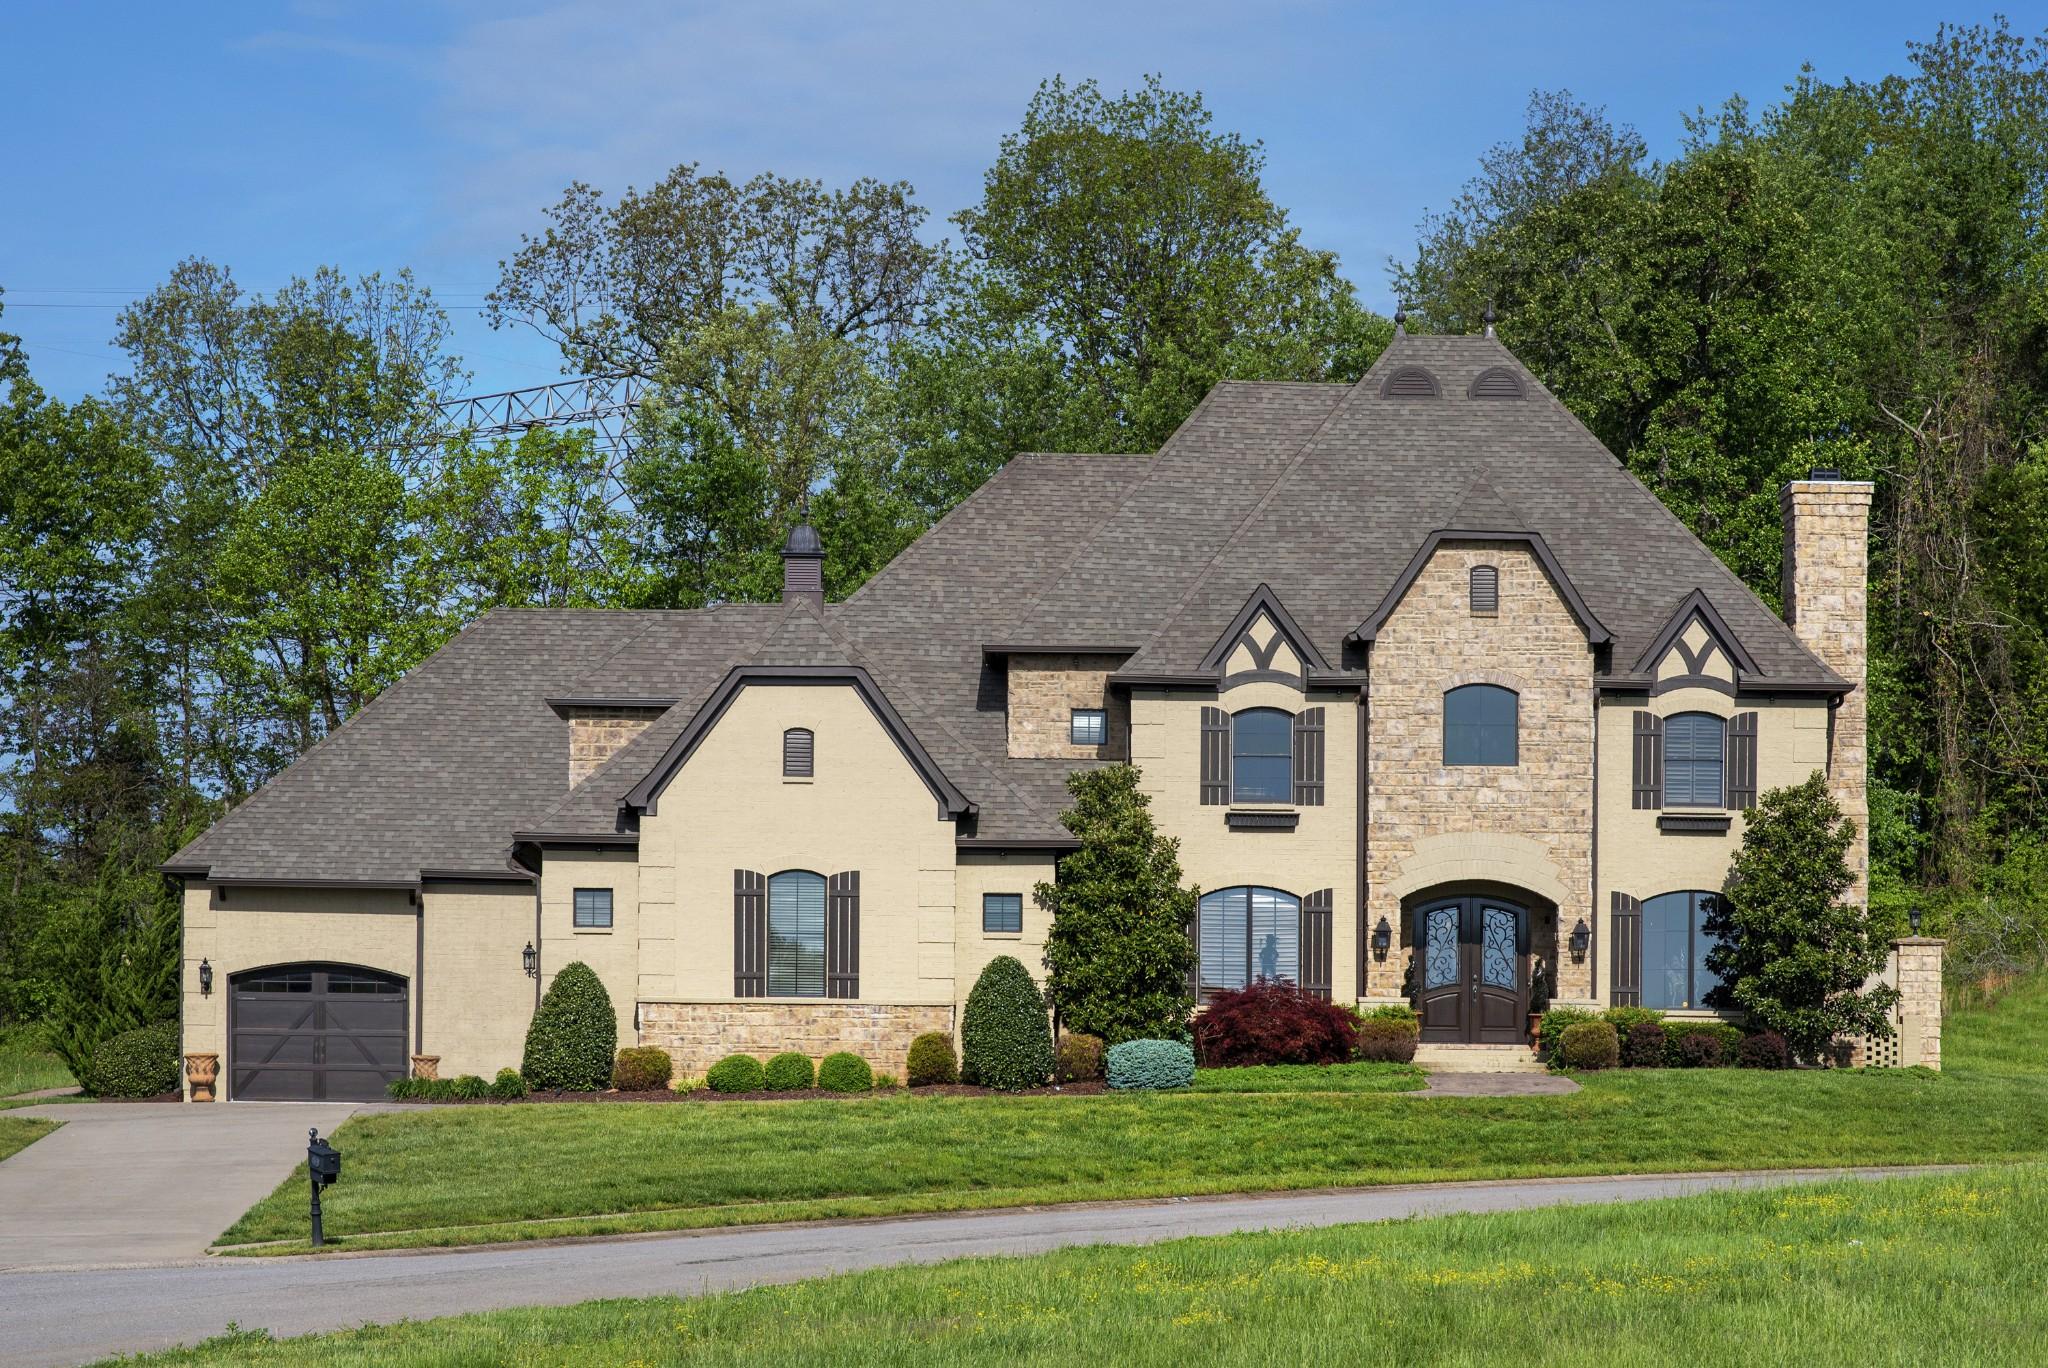 1448 Collins View Way, Clarksville, TN 37043 - Clarksville, TN real estate listing